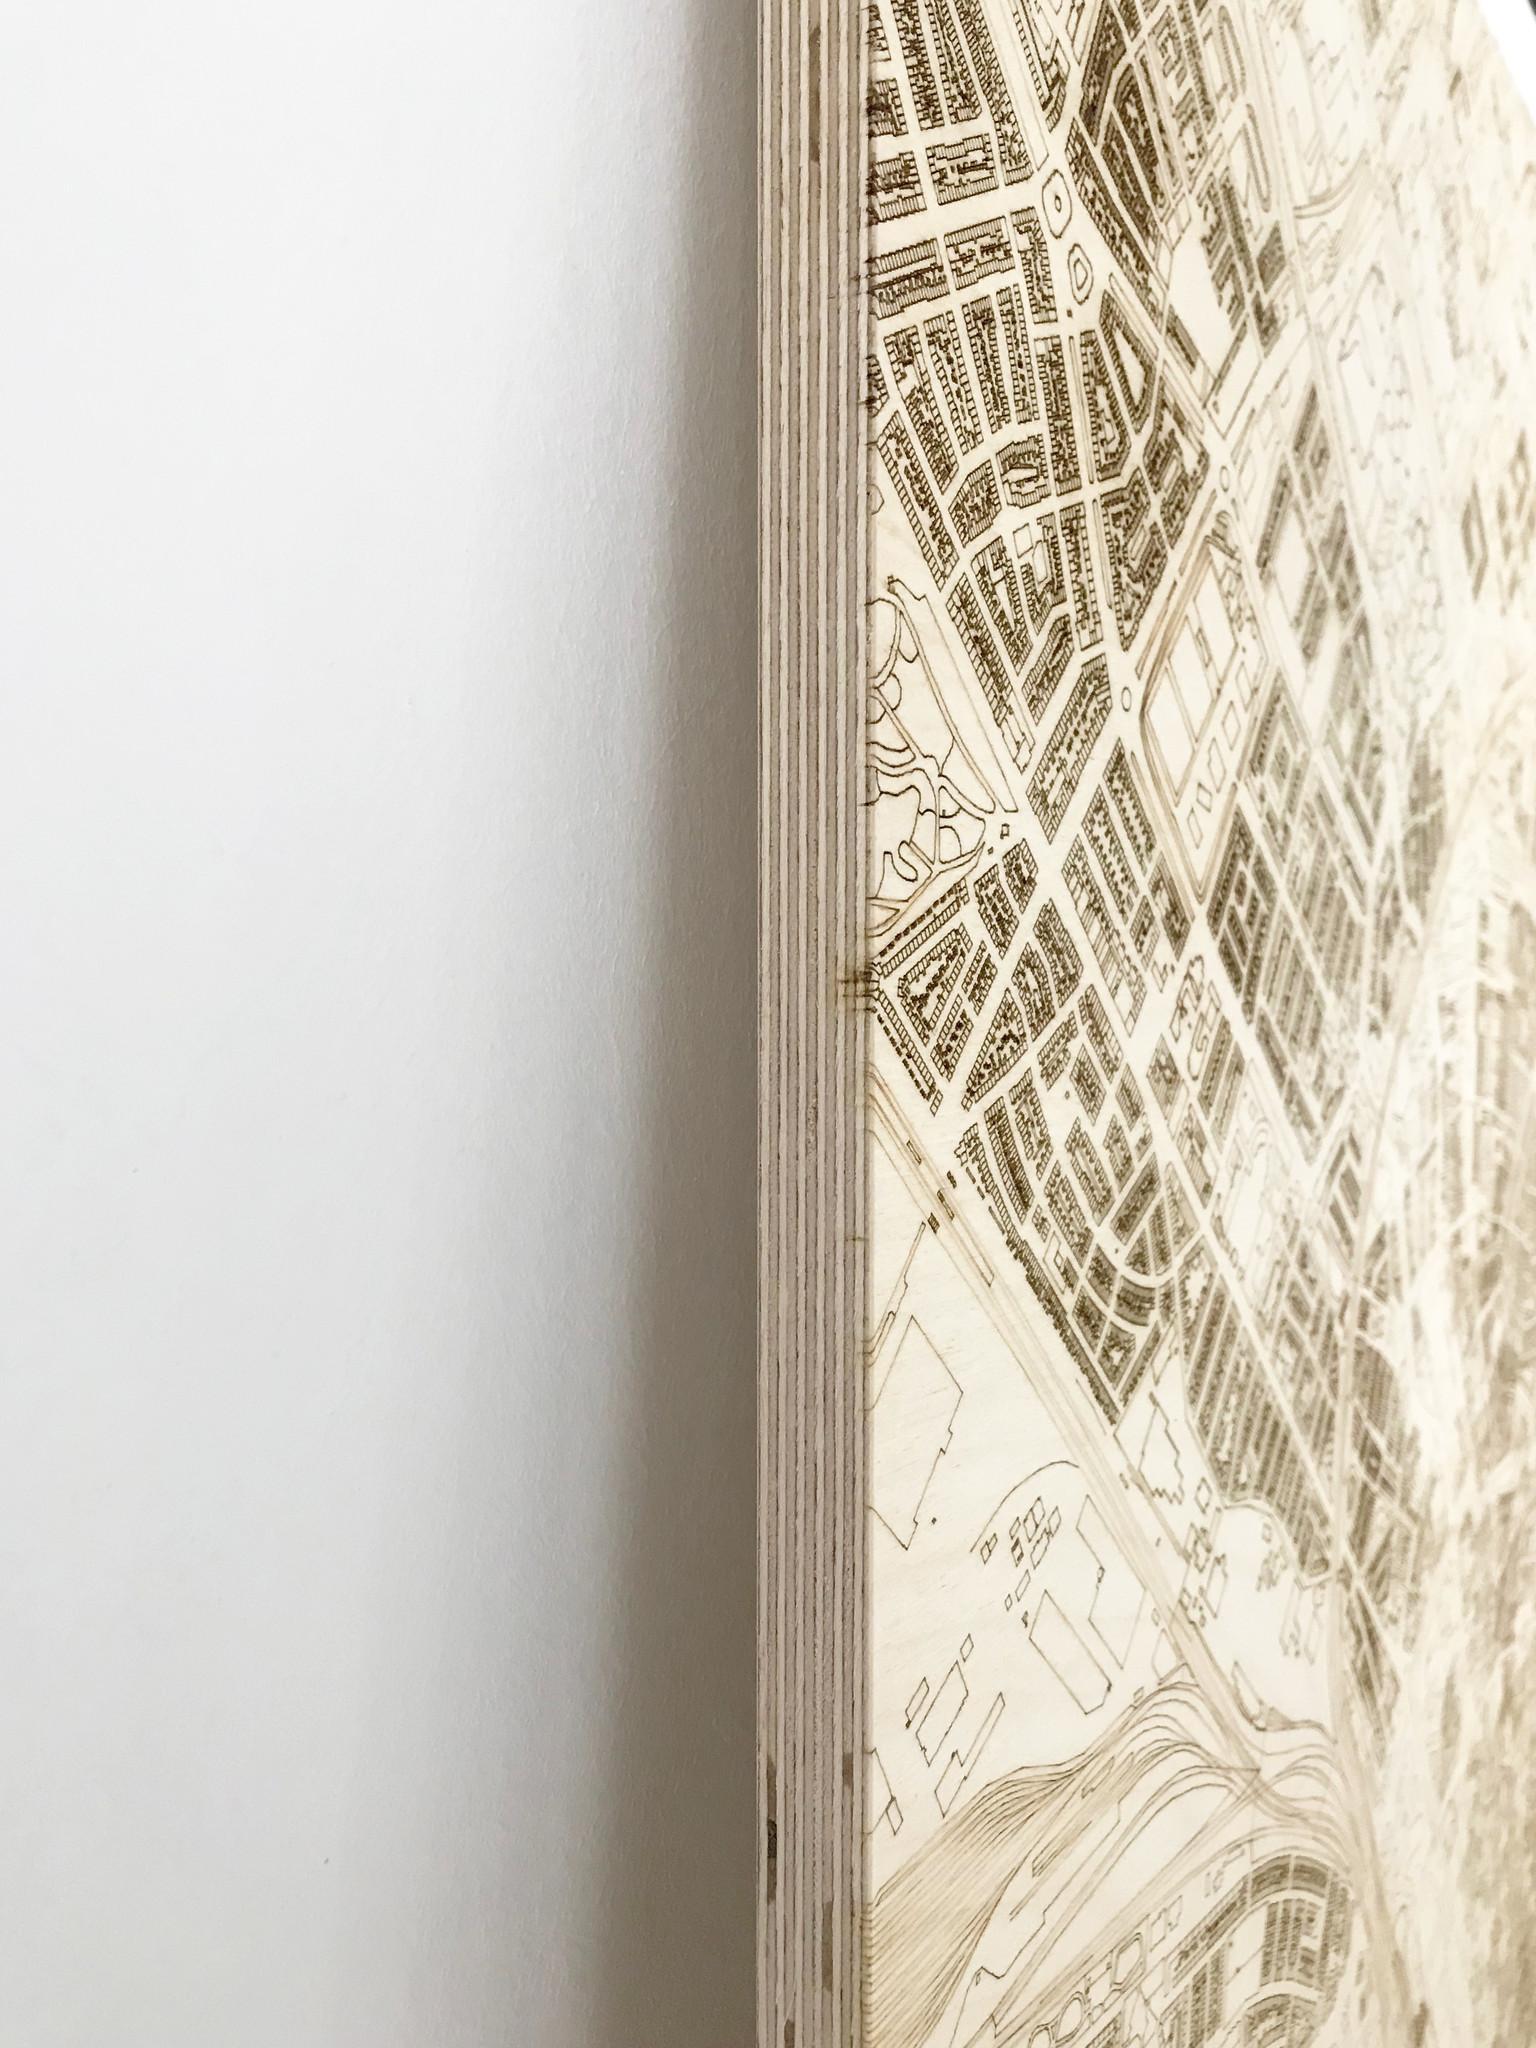 Wanddekoration aus Holz Wandbild Nijverdal Stadtplan-5